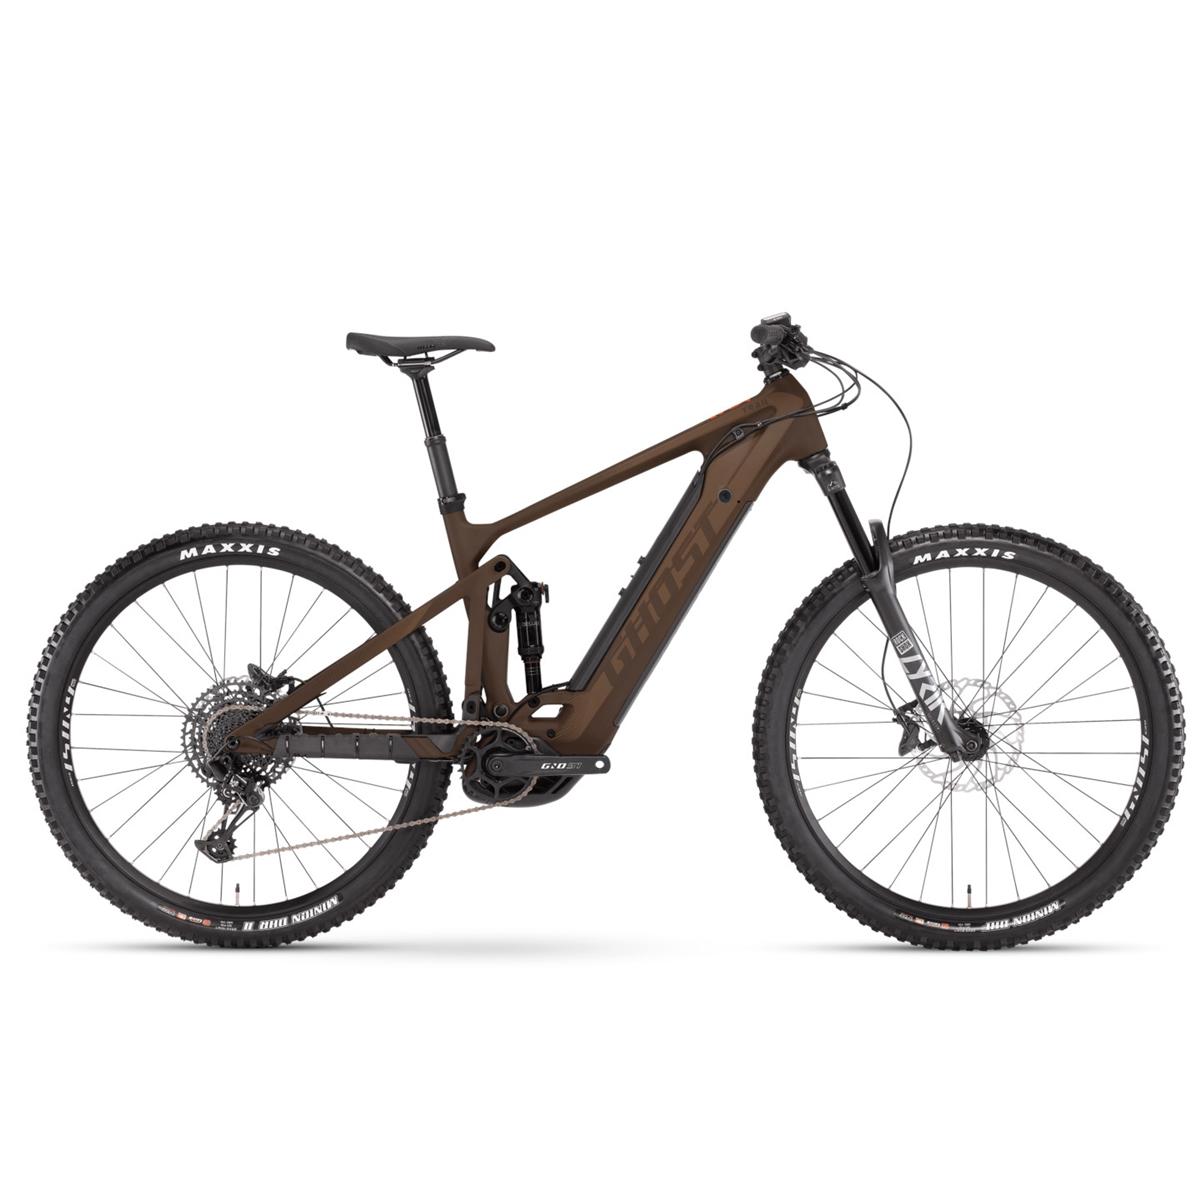 E-Riot Trail CF Advanced 27.5'' 150mm 12s Bosch CX 625Wh Brown 2021 Size S